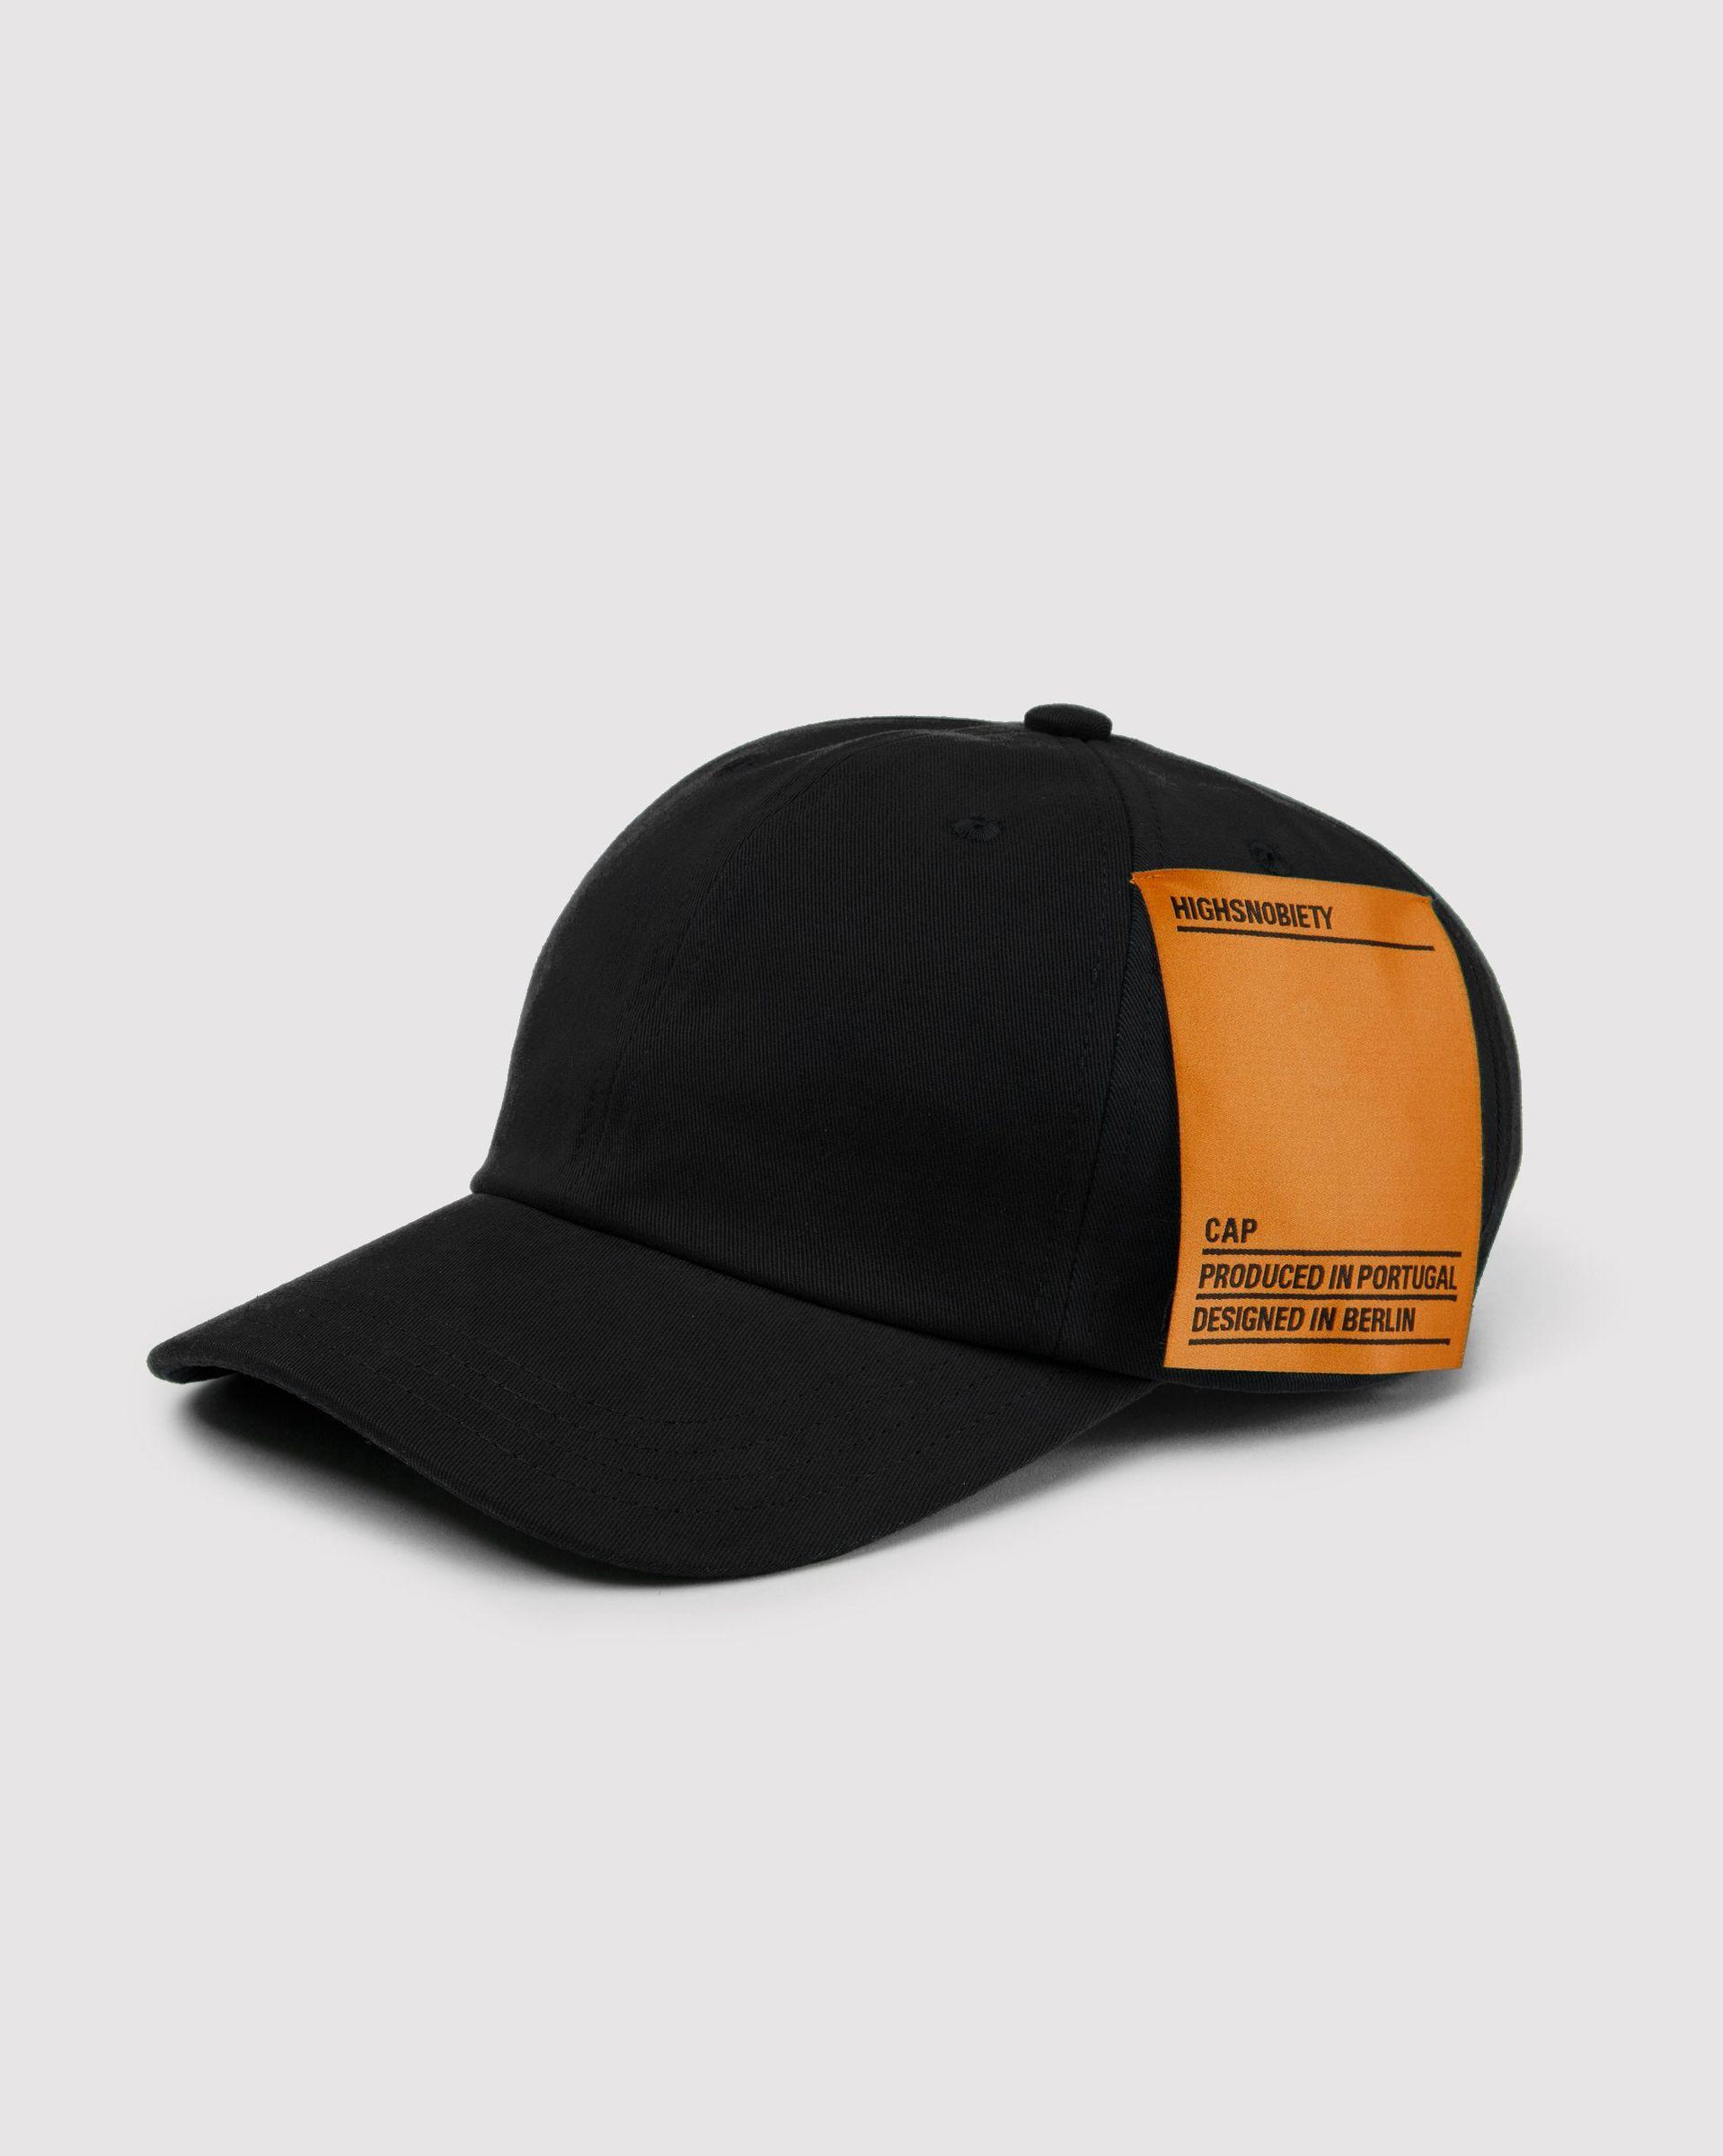 Highsnobiety Staples - Cap Black - Image 4